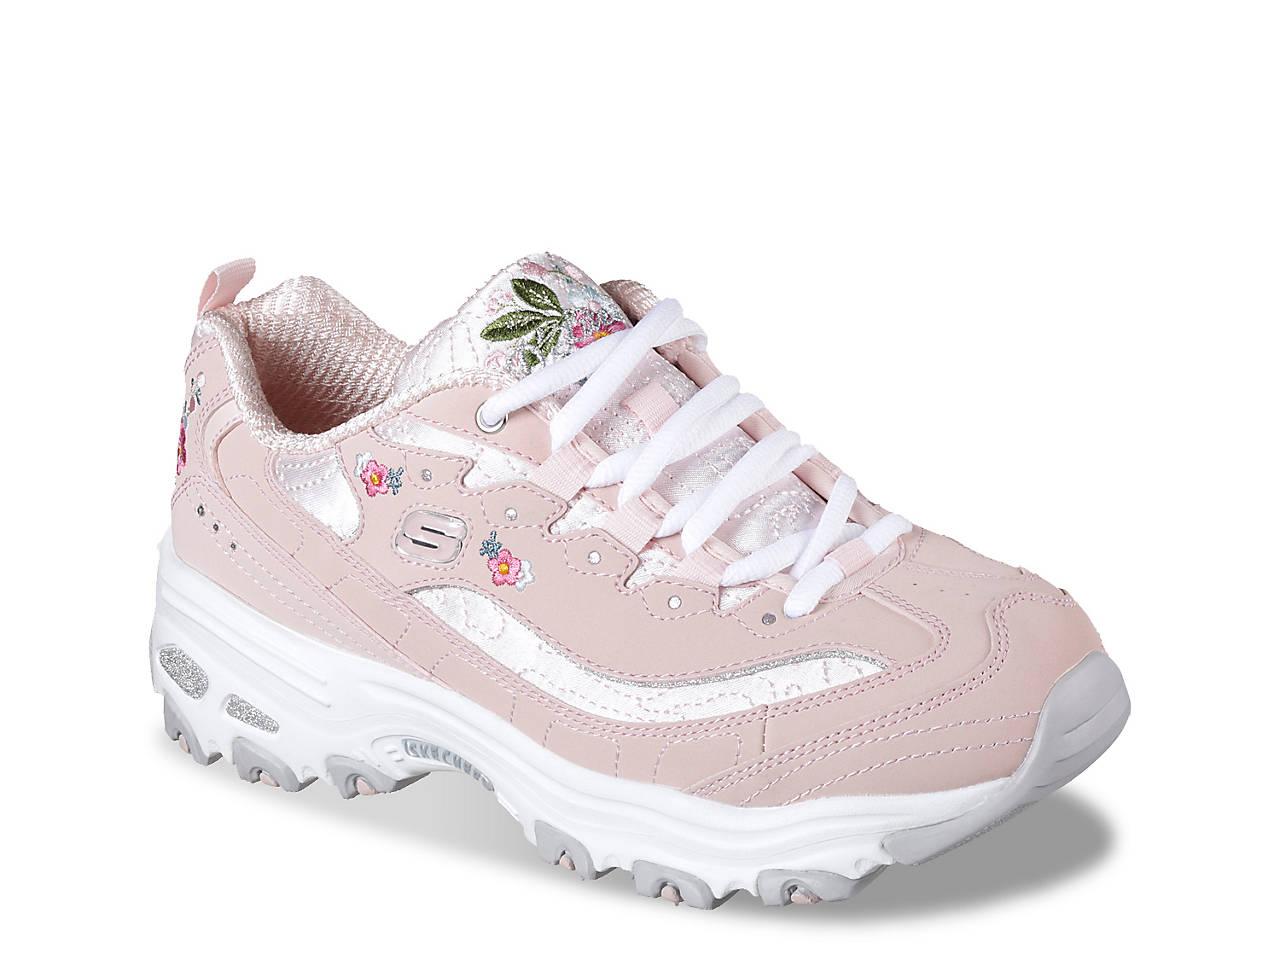 23f25f461148 Skechers D Lites Bright Blossoms Sneaker - Women s Women s Shoes